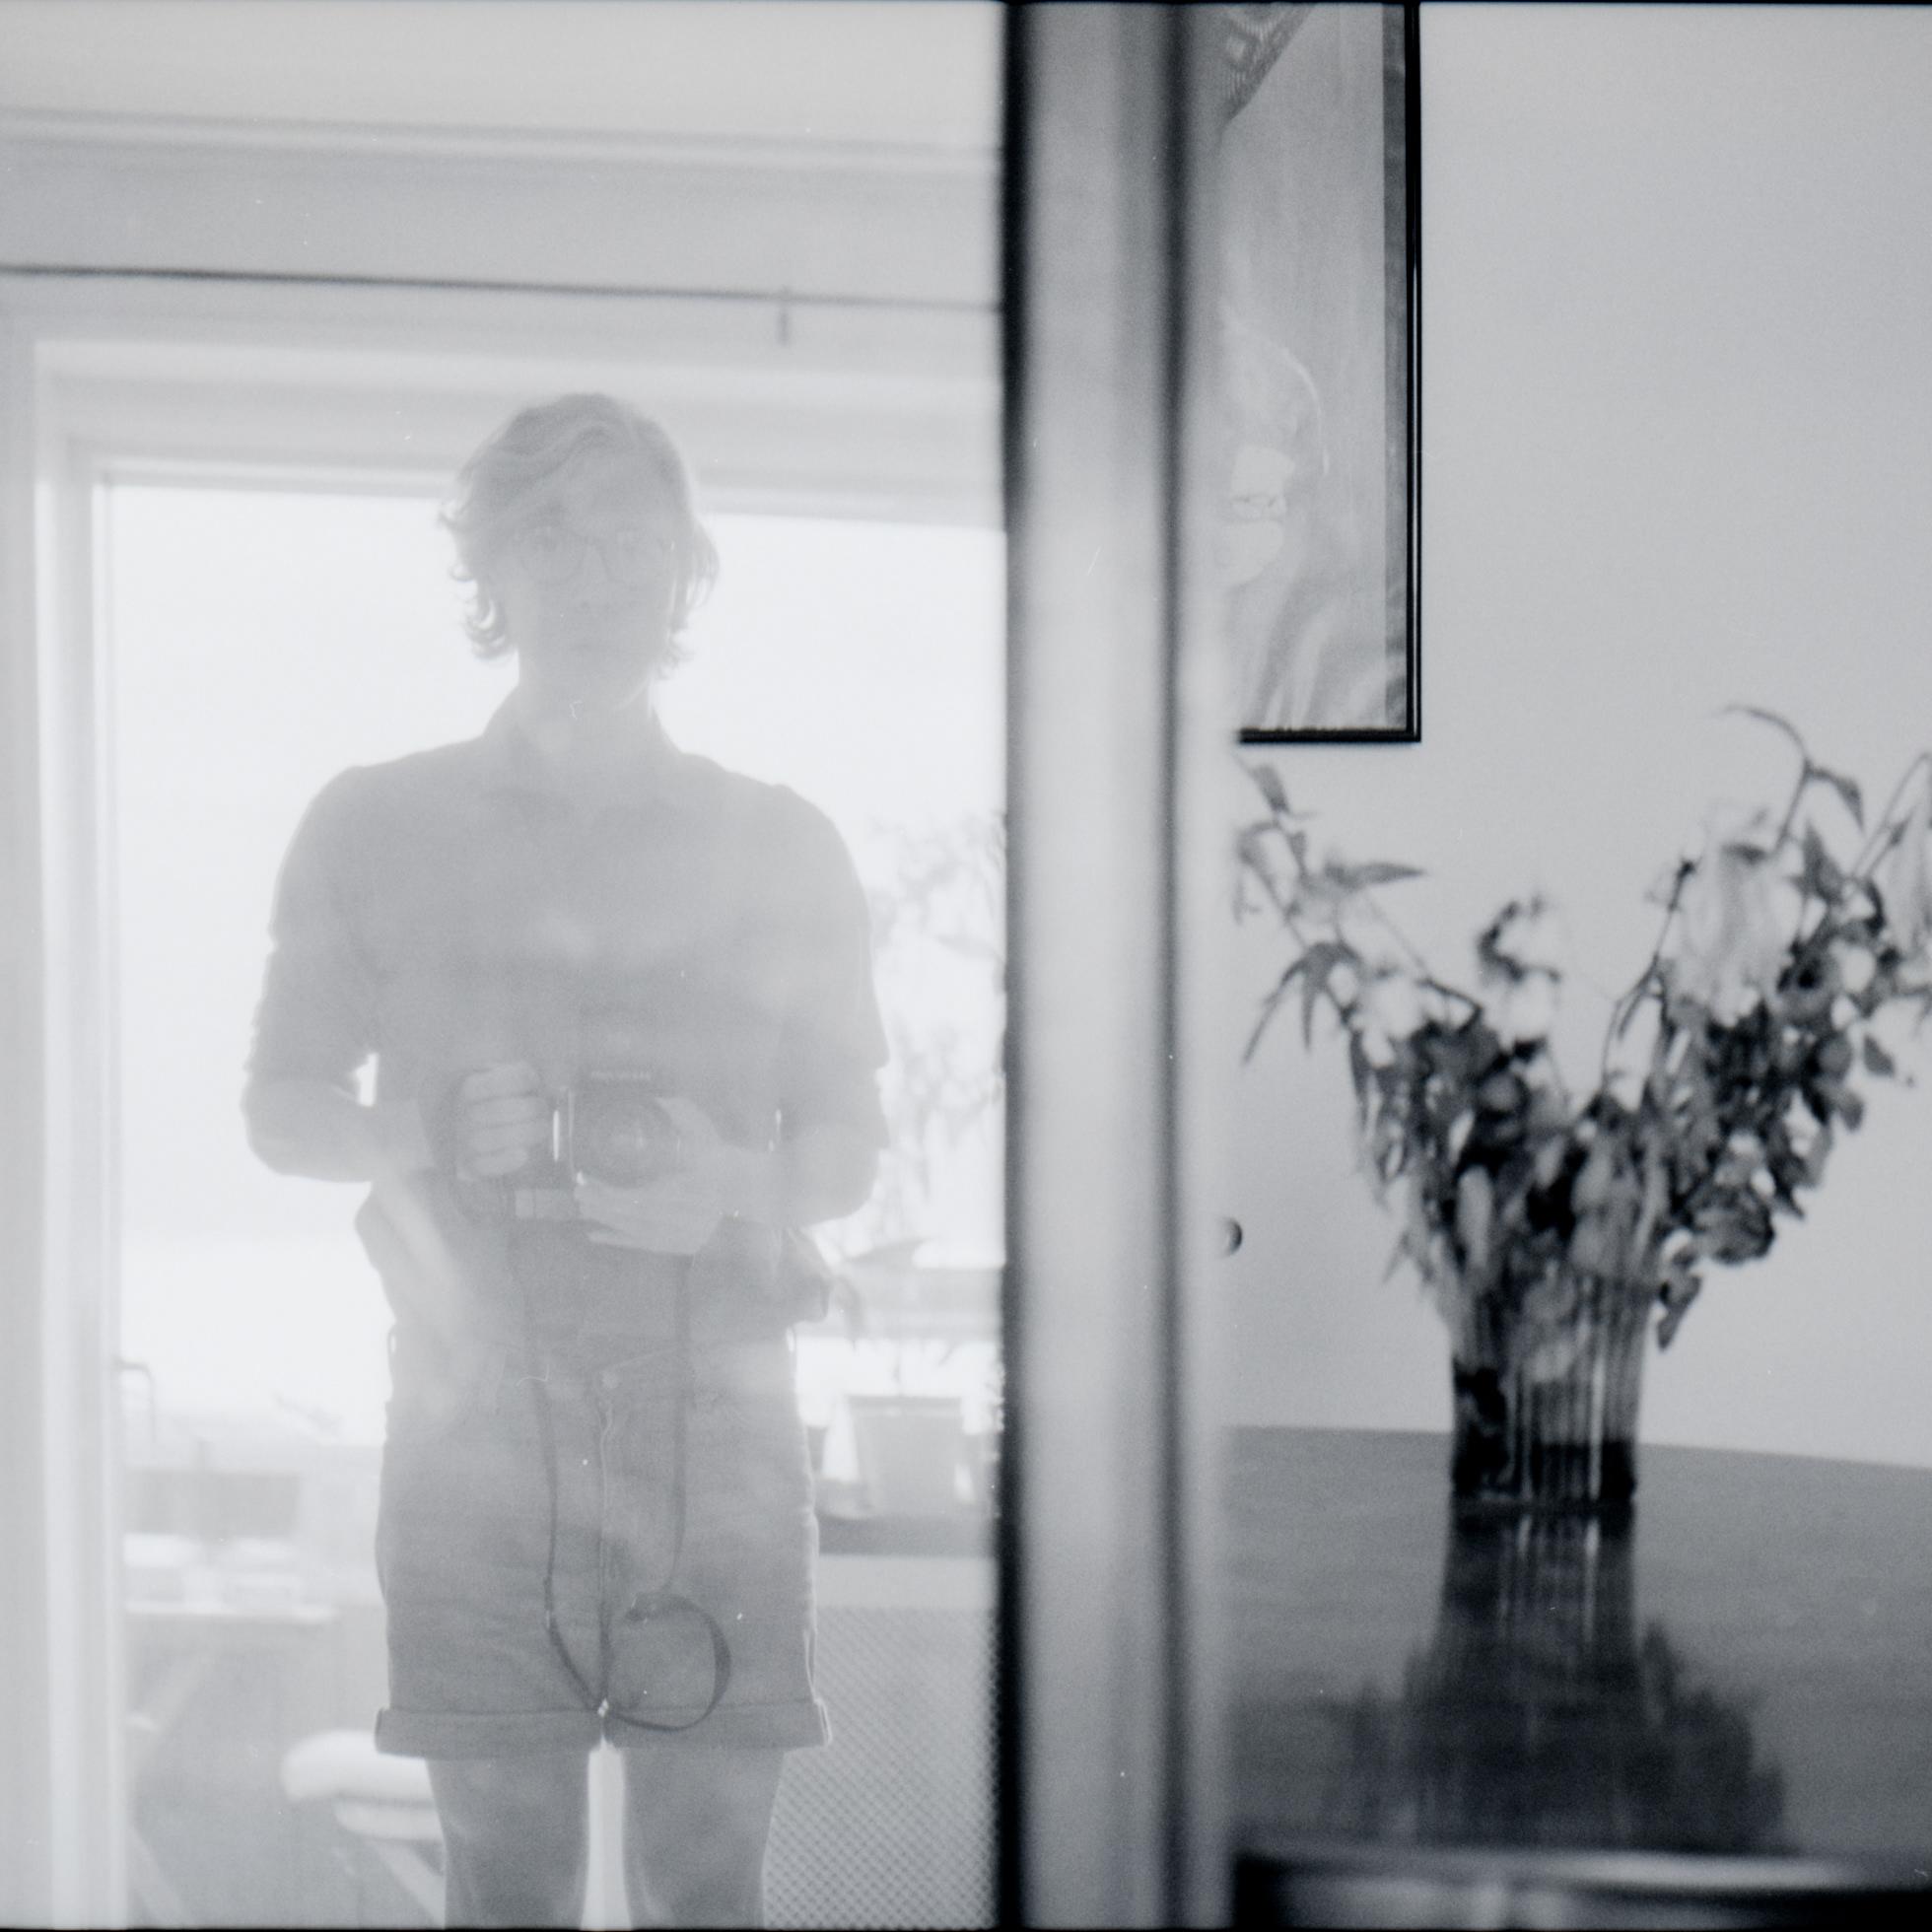 Deadpan photography essay